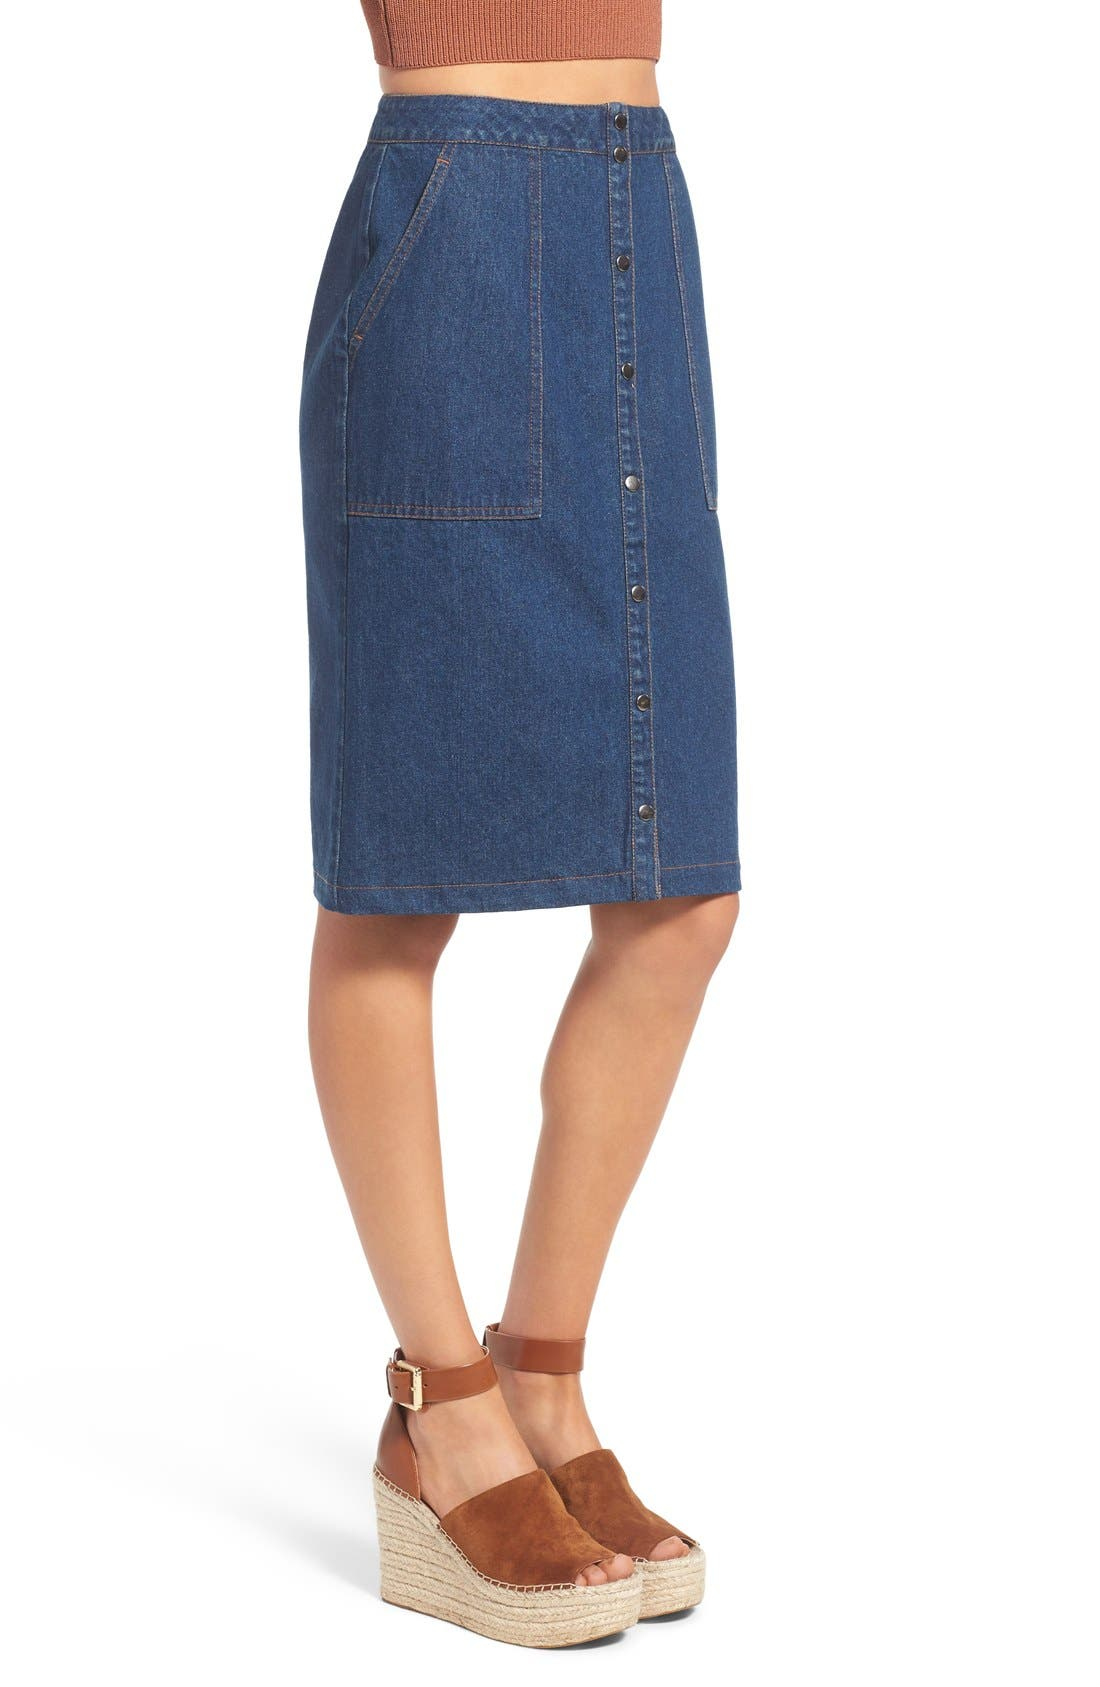 Alternate Image 3  - ASTR 'Francisca' Button Front Denim Skirt